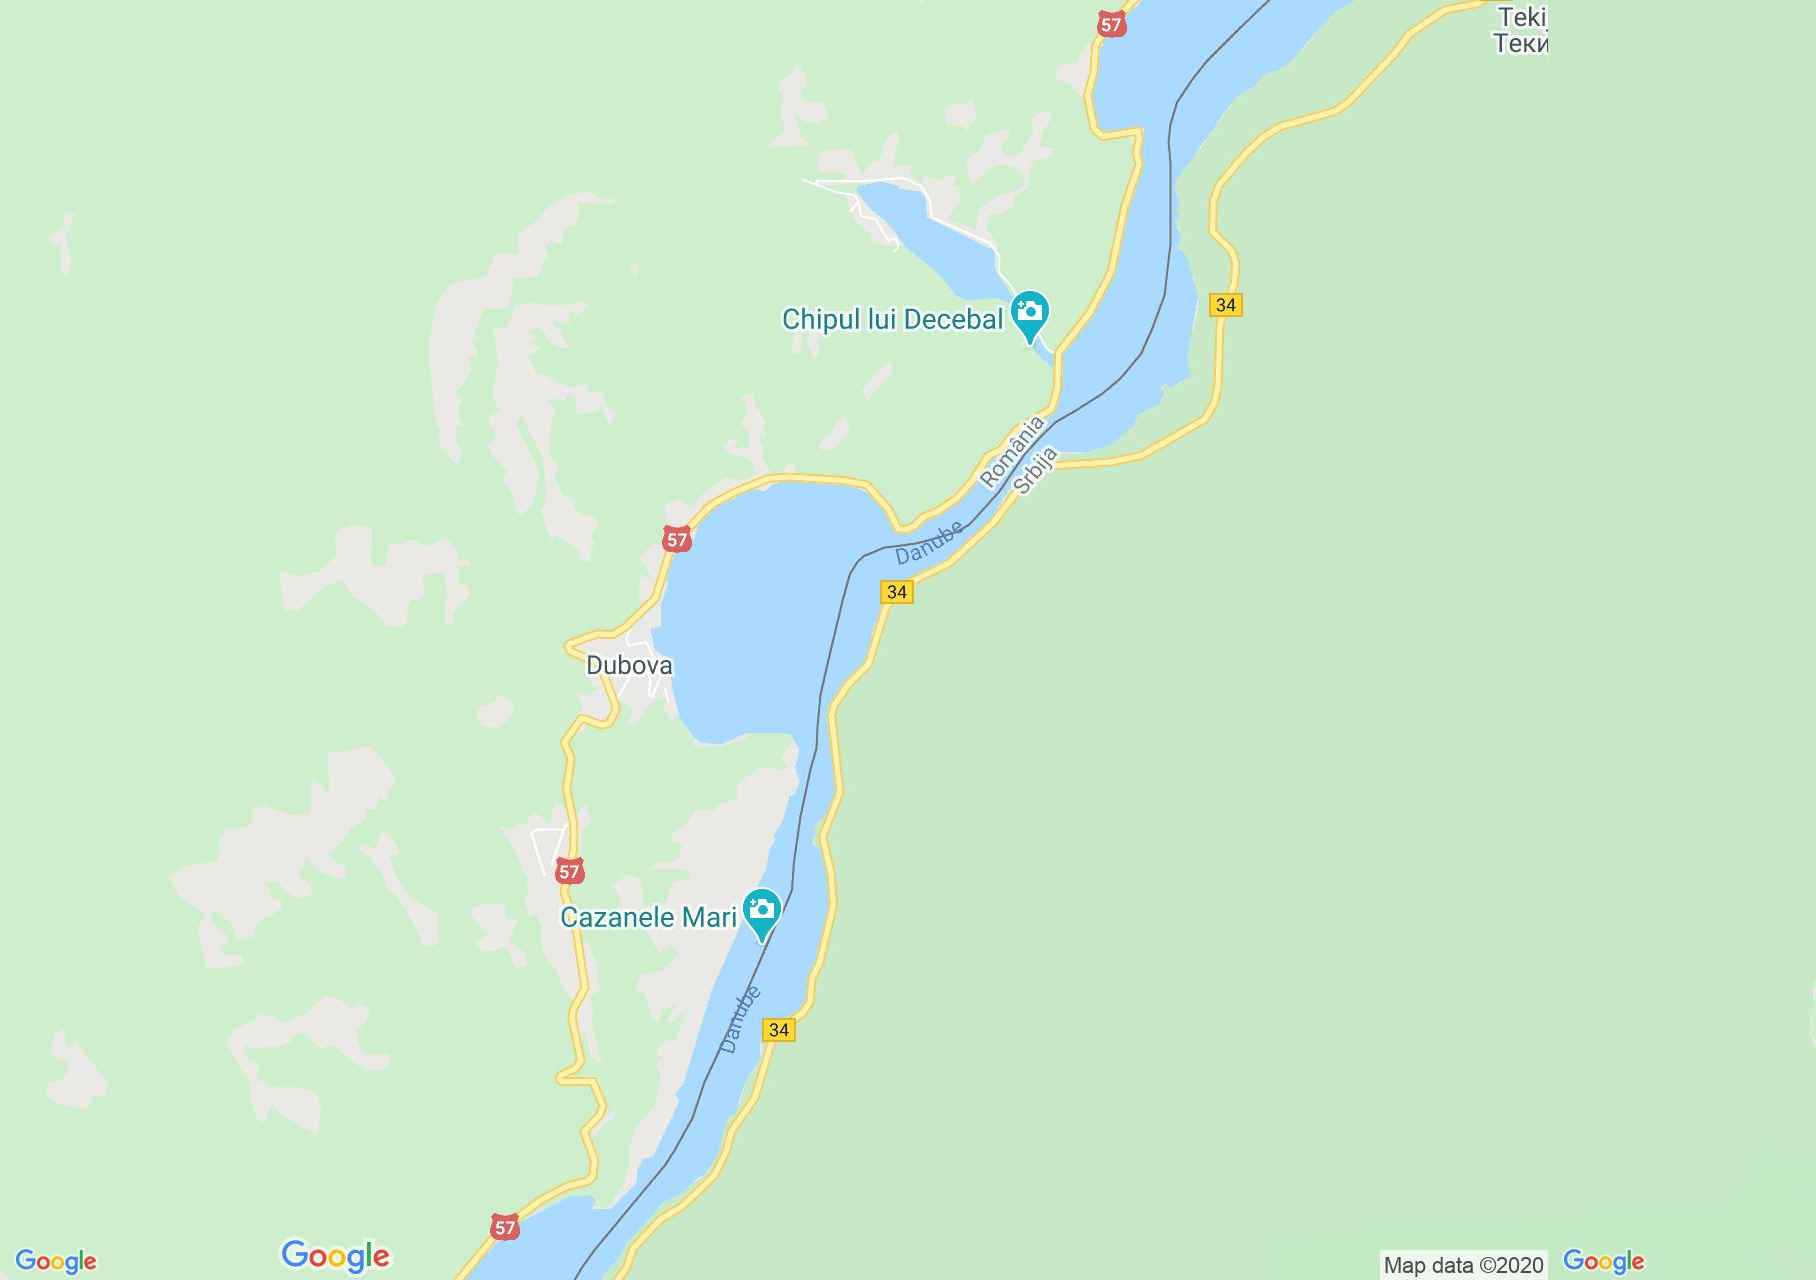 Duna szoros interaktív turista térképe.